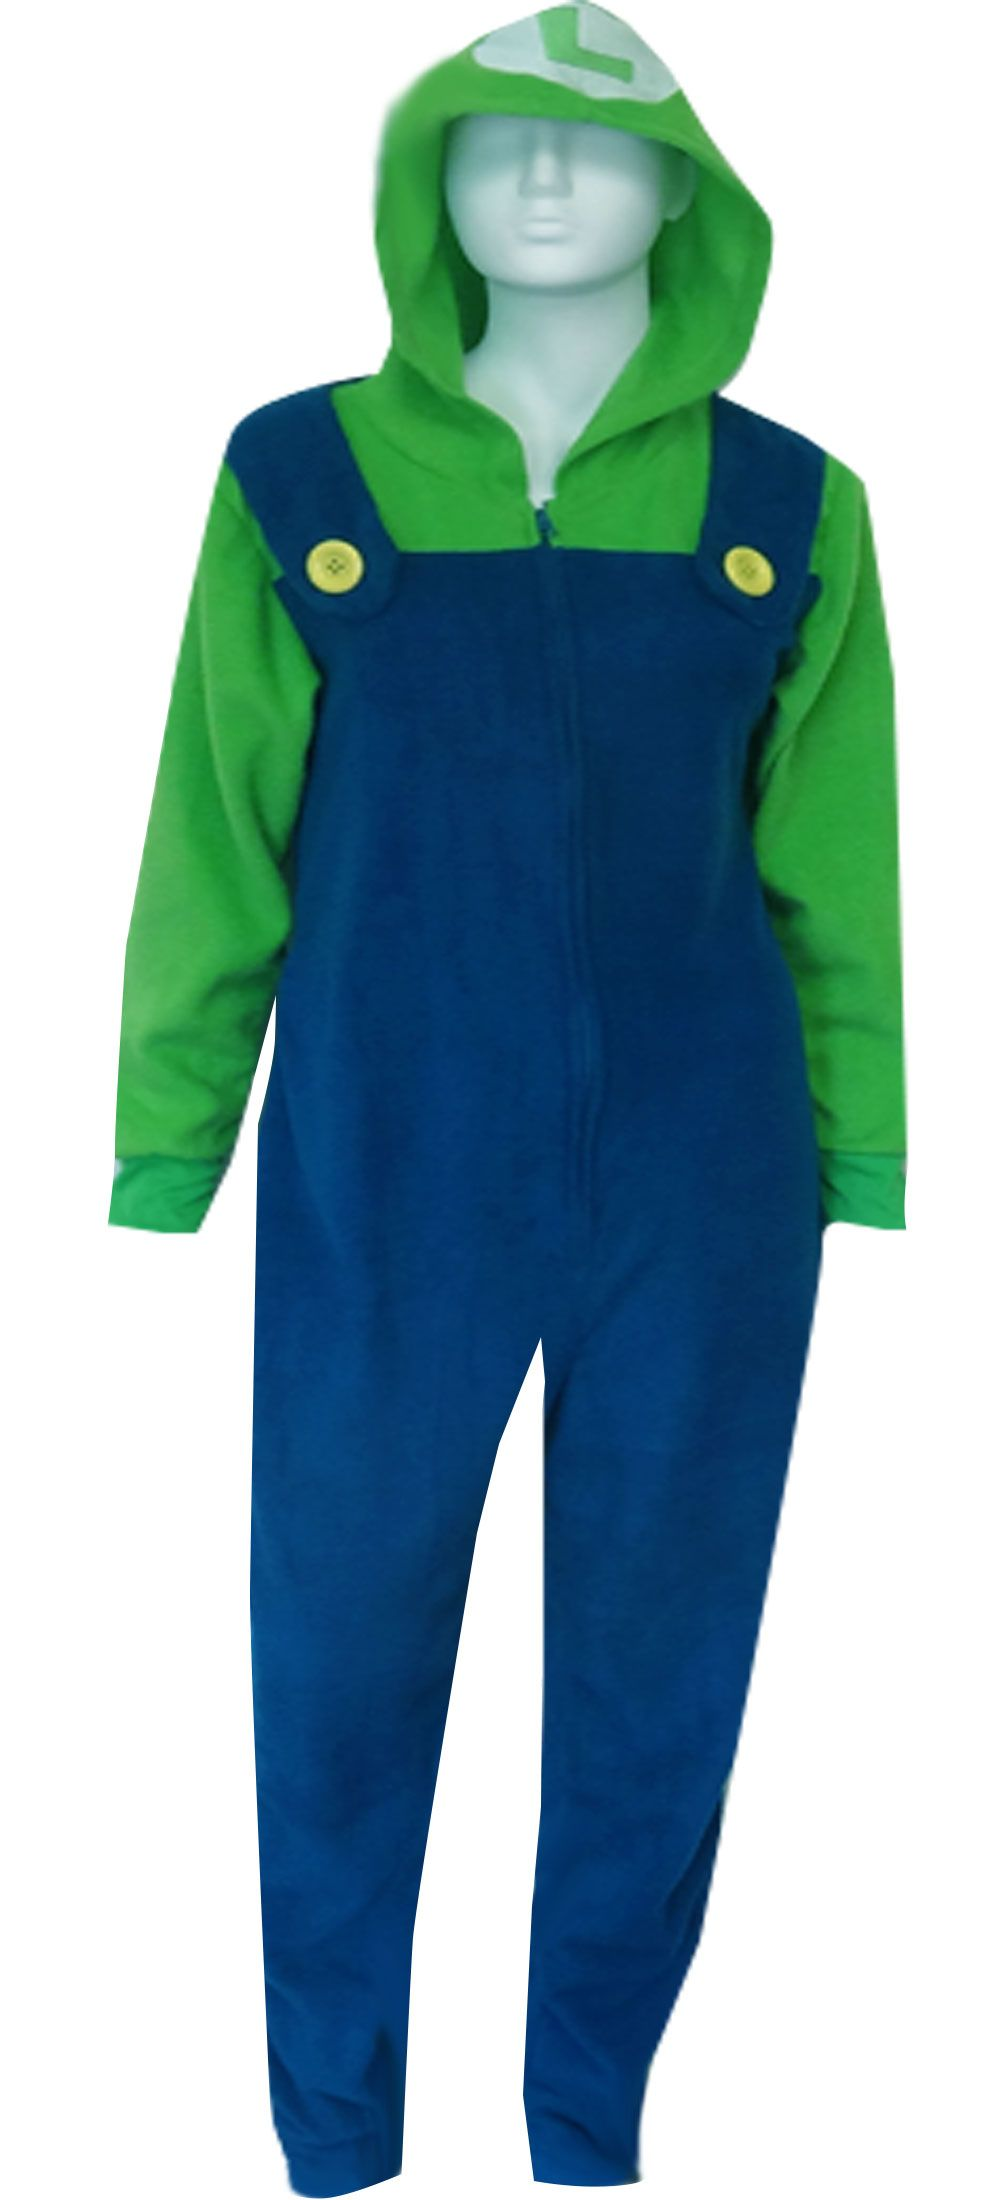 c5d5613a WebUndies.com Nintendo Super Mario Brothers Luigi Hooded Onesie Pajama